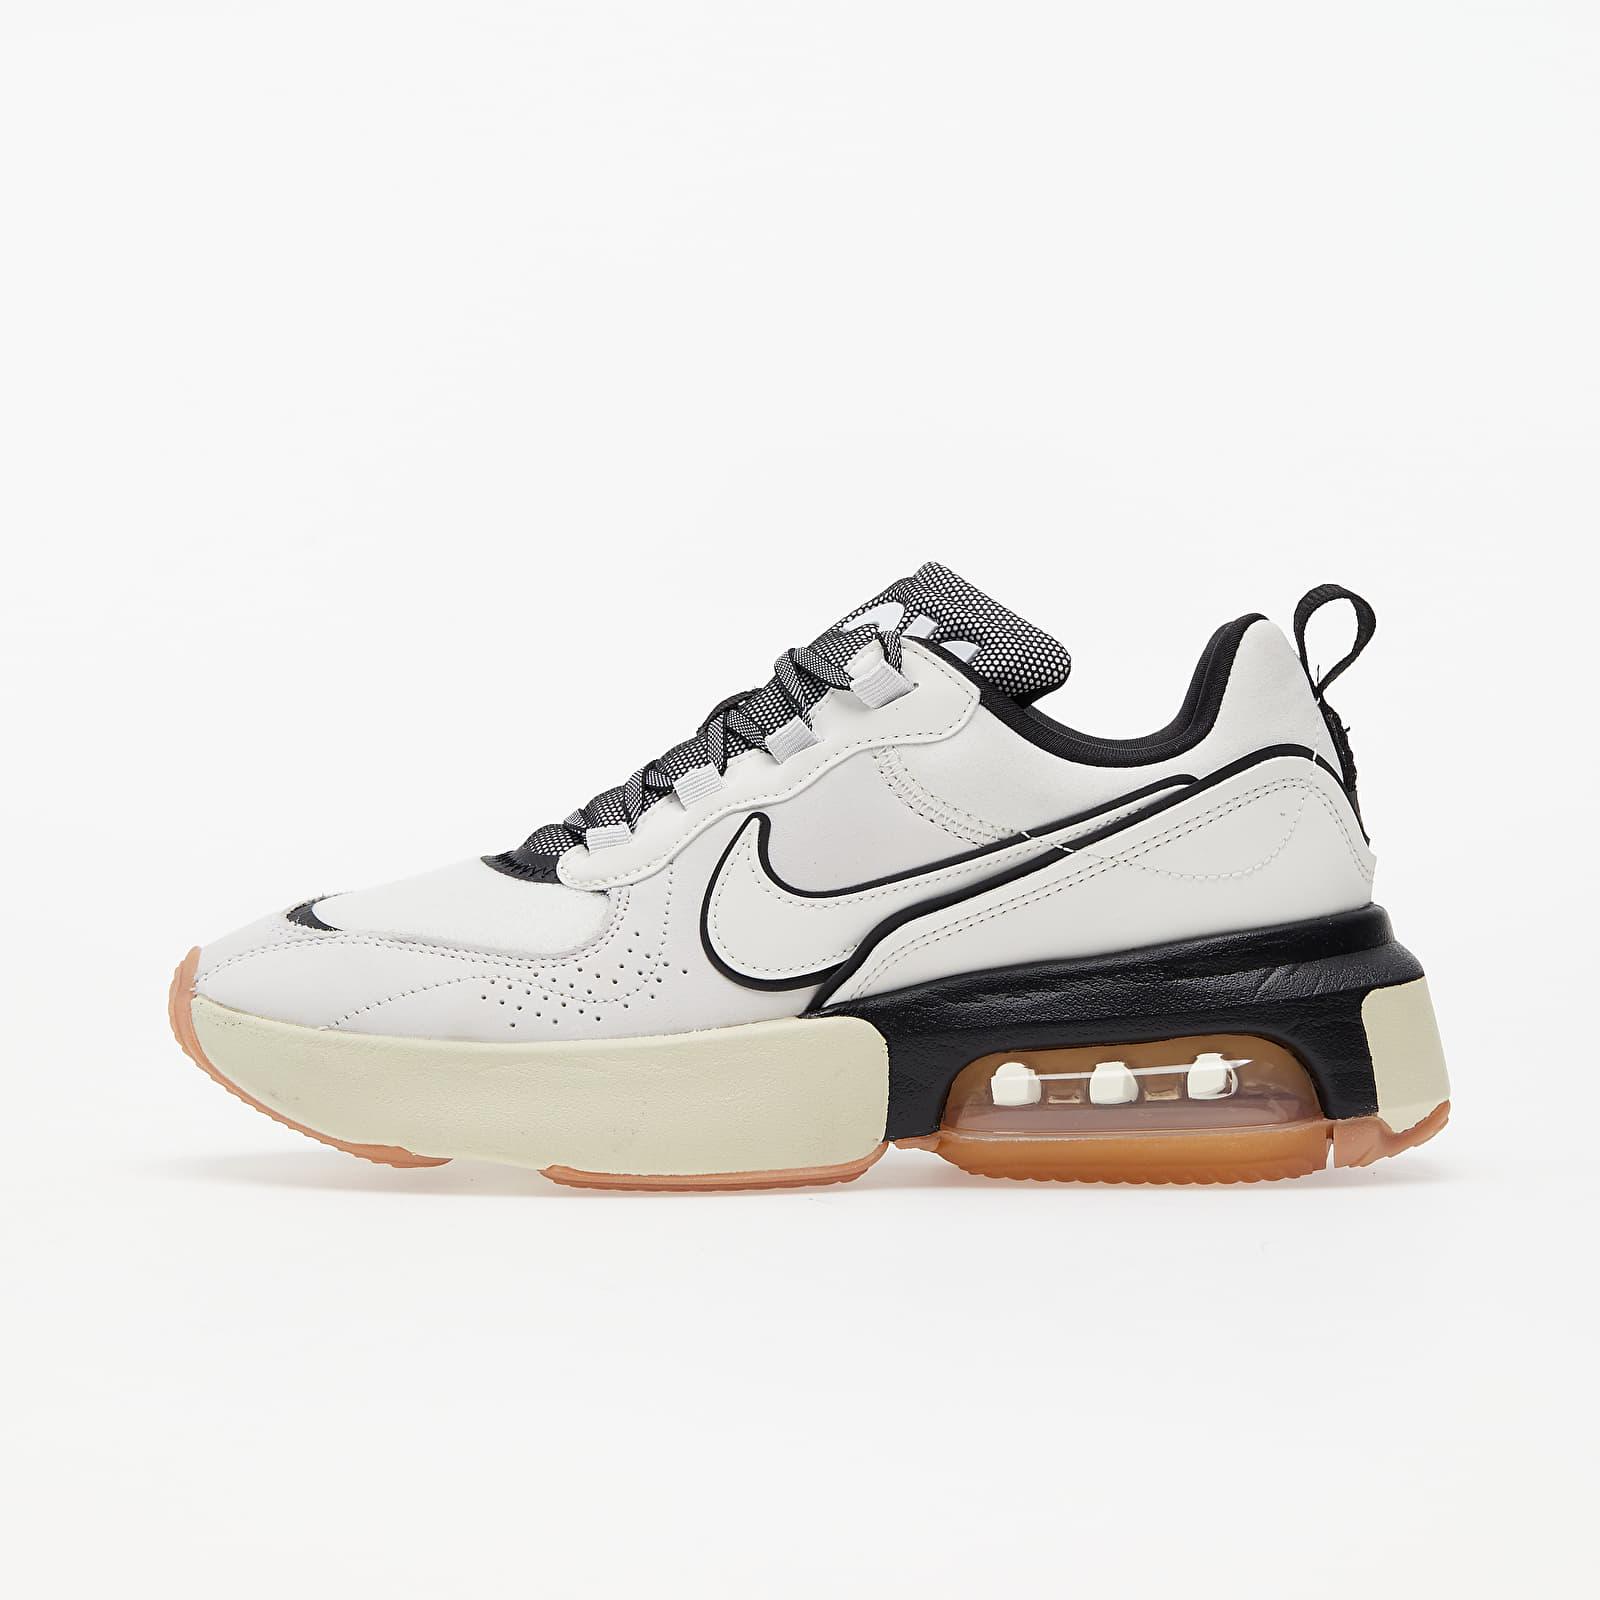 Încălțăminte și sneakerși pentru femei Nike W Air Max Verona White/ Sail-Pale Ivory-Gum Med Brown